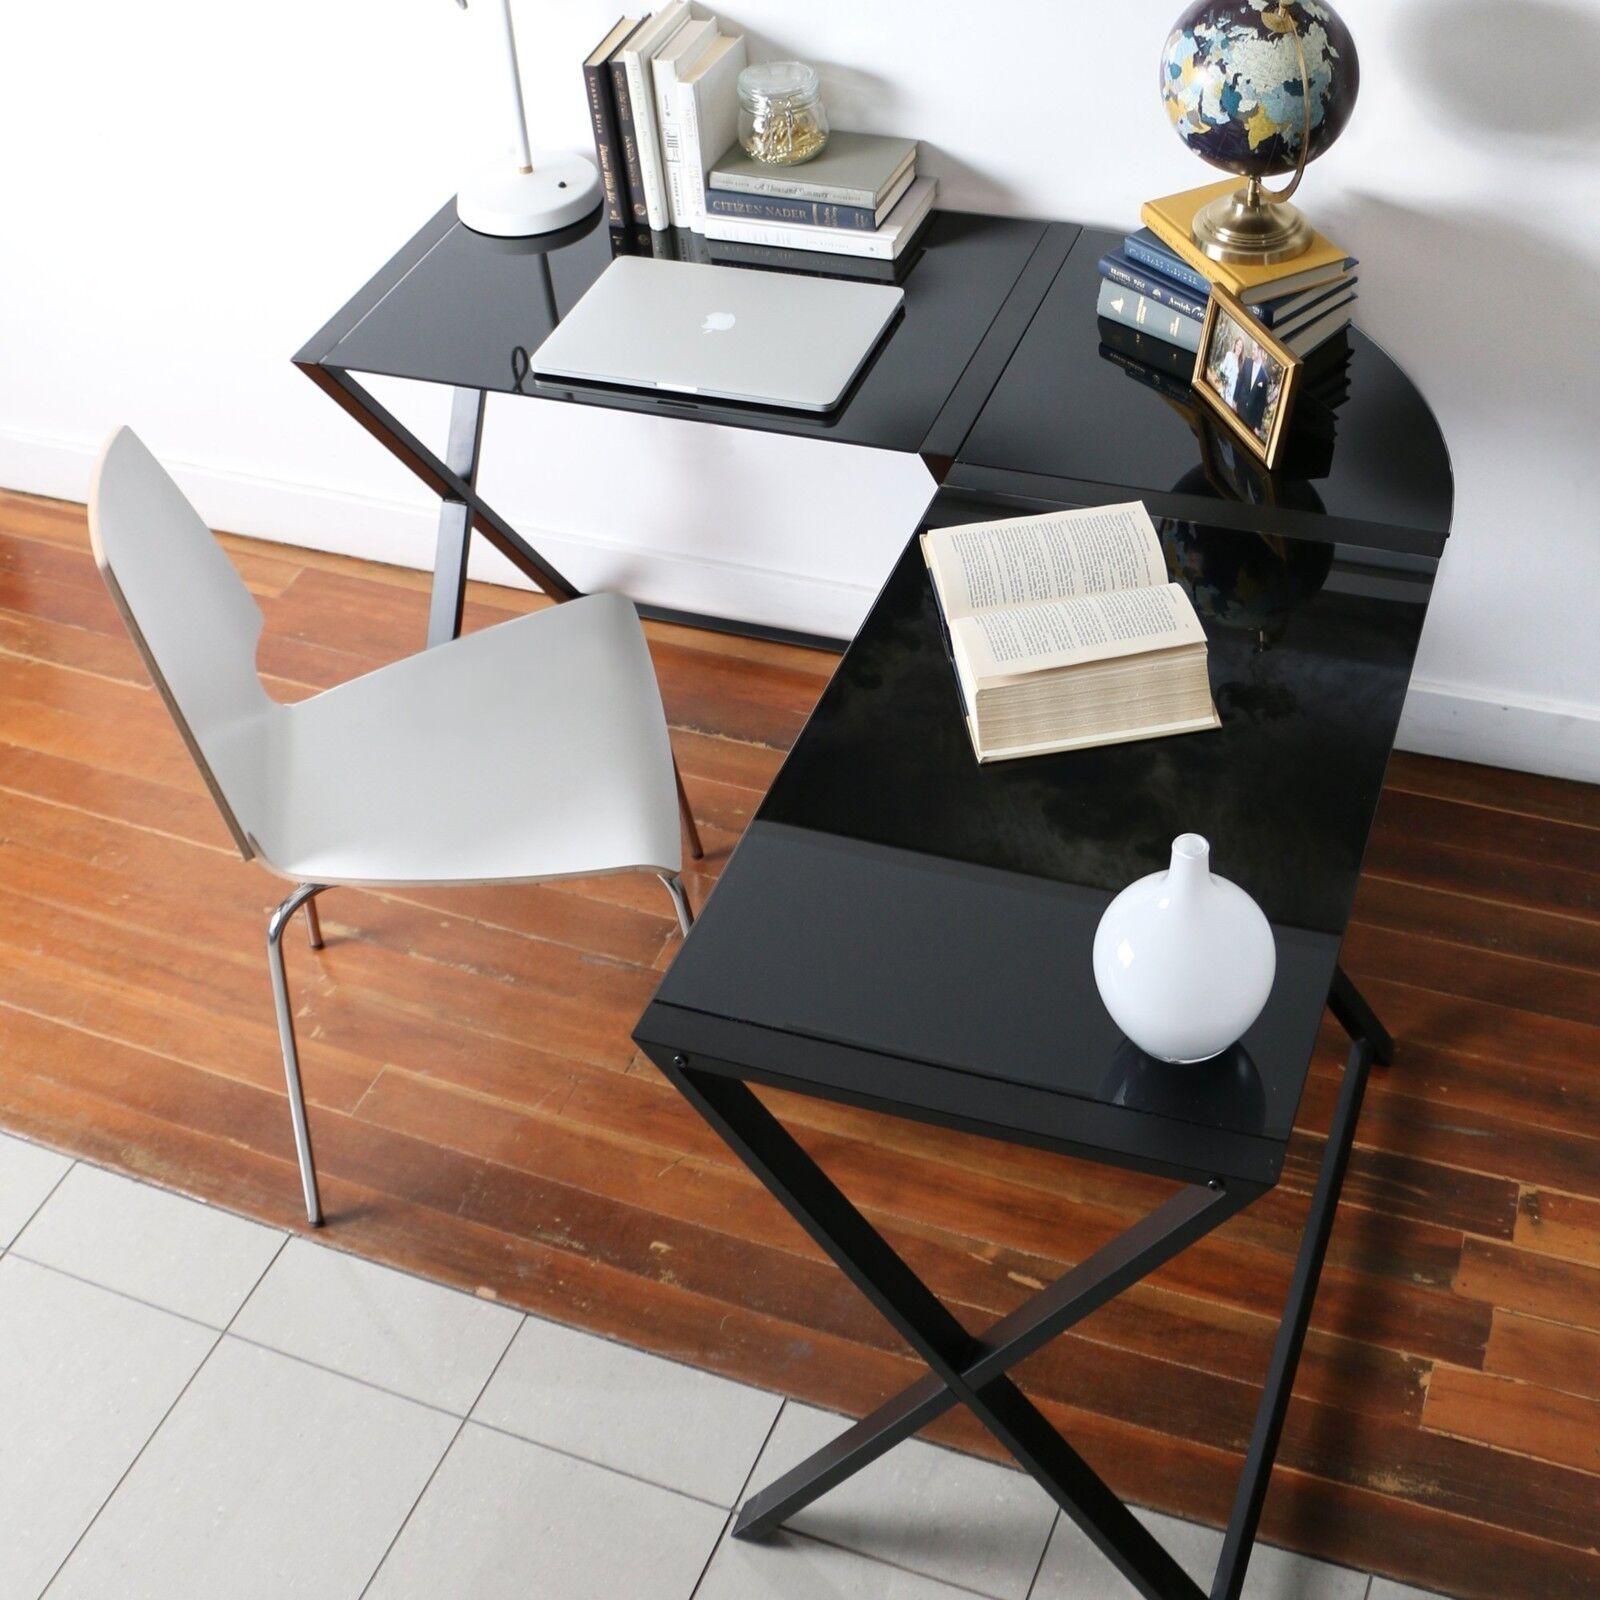 Details about Glass Corner Computer Desk Black For Small Space L Shape  Modern under 100 Dolla